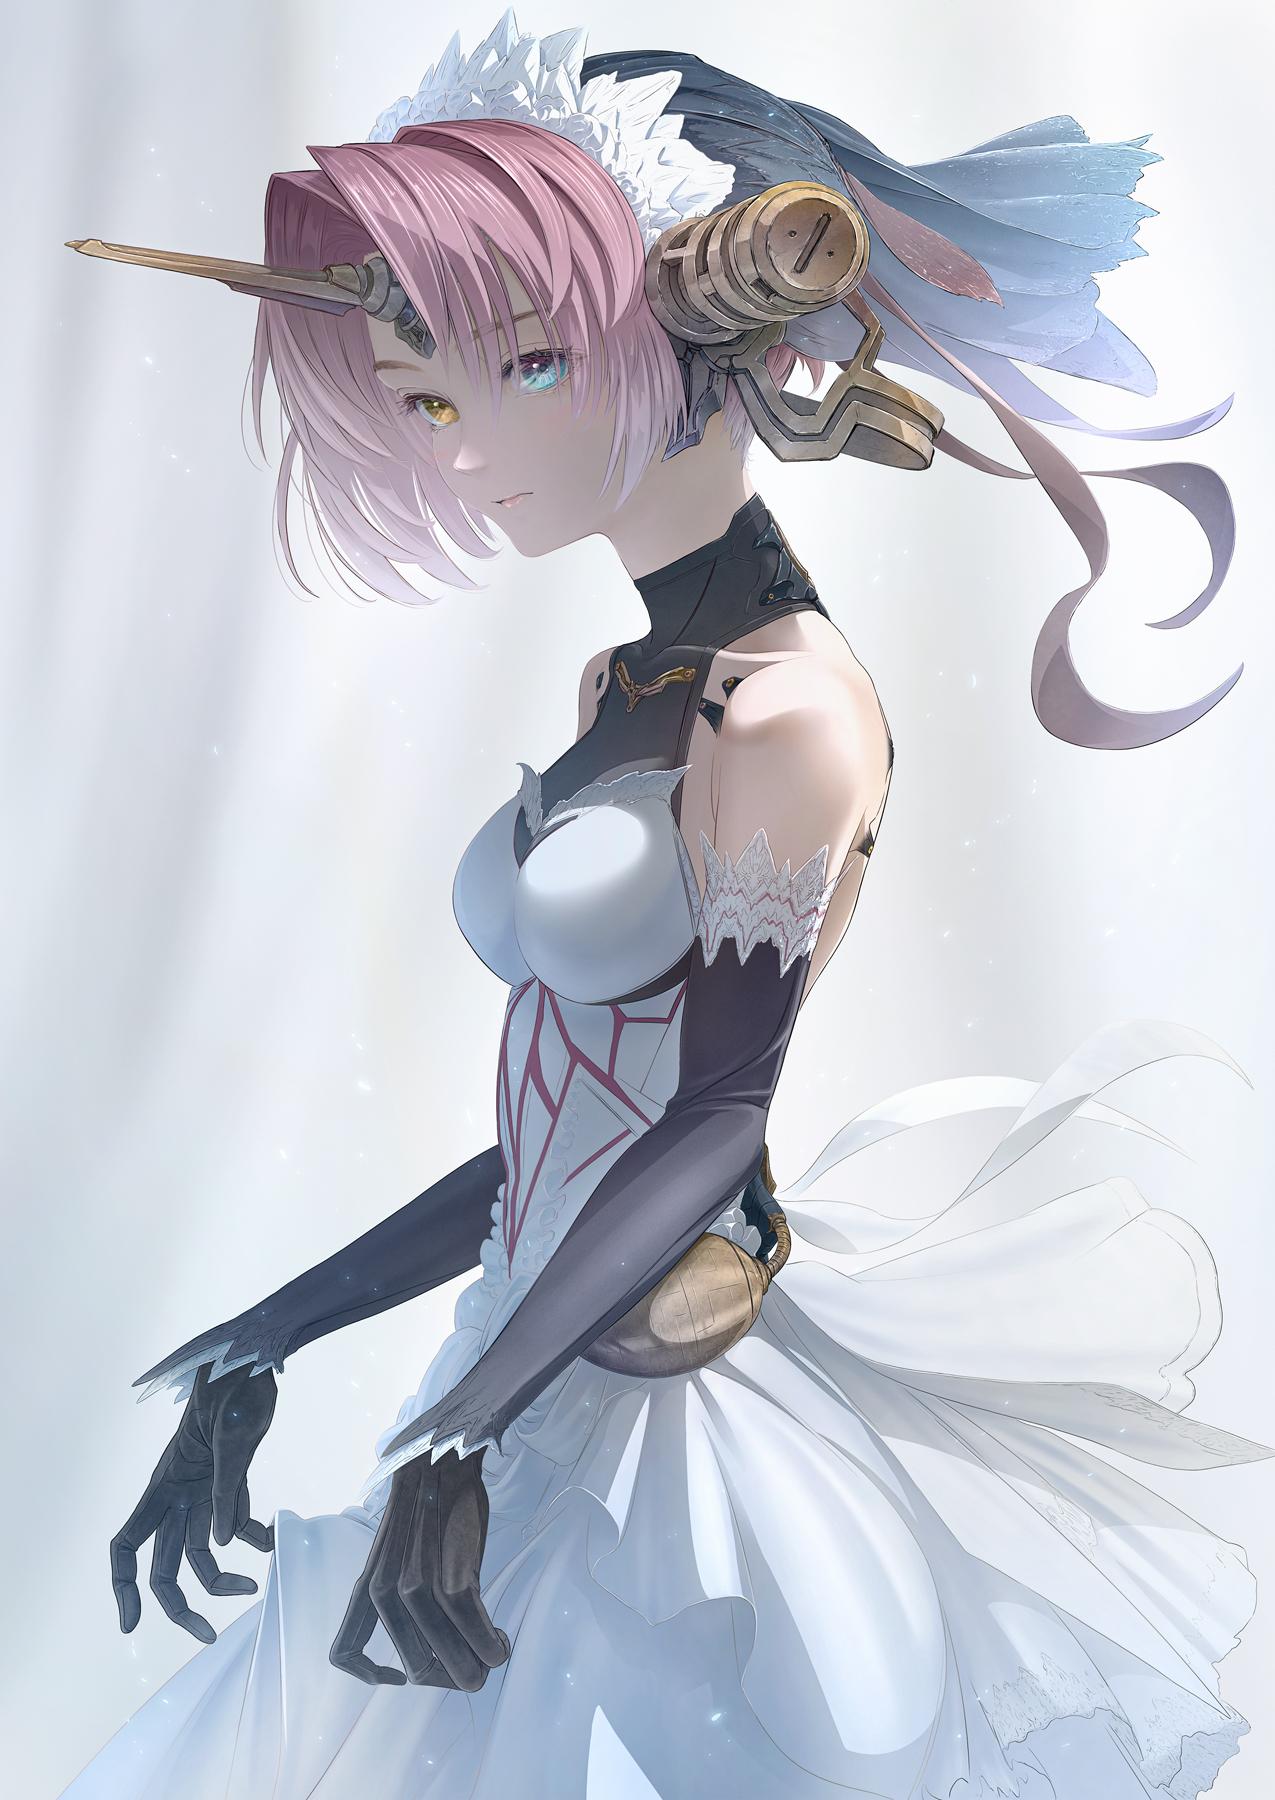 Fate Apocrypha Fate Series FGO Monster Girl Metal Horns Short Hair Black Gloves Heterochromia Blushi 1275x1800